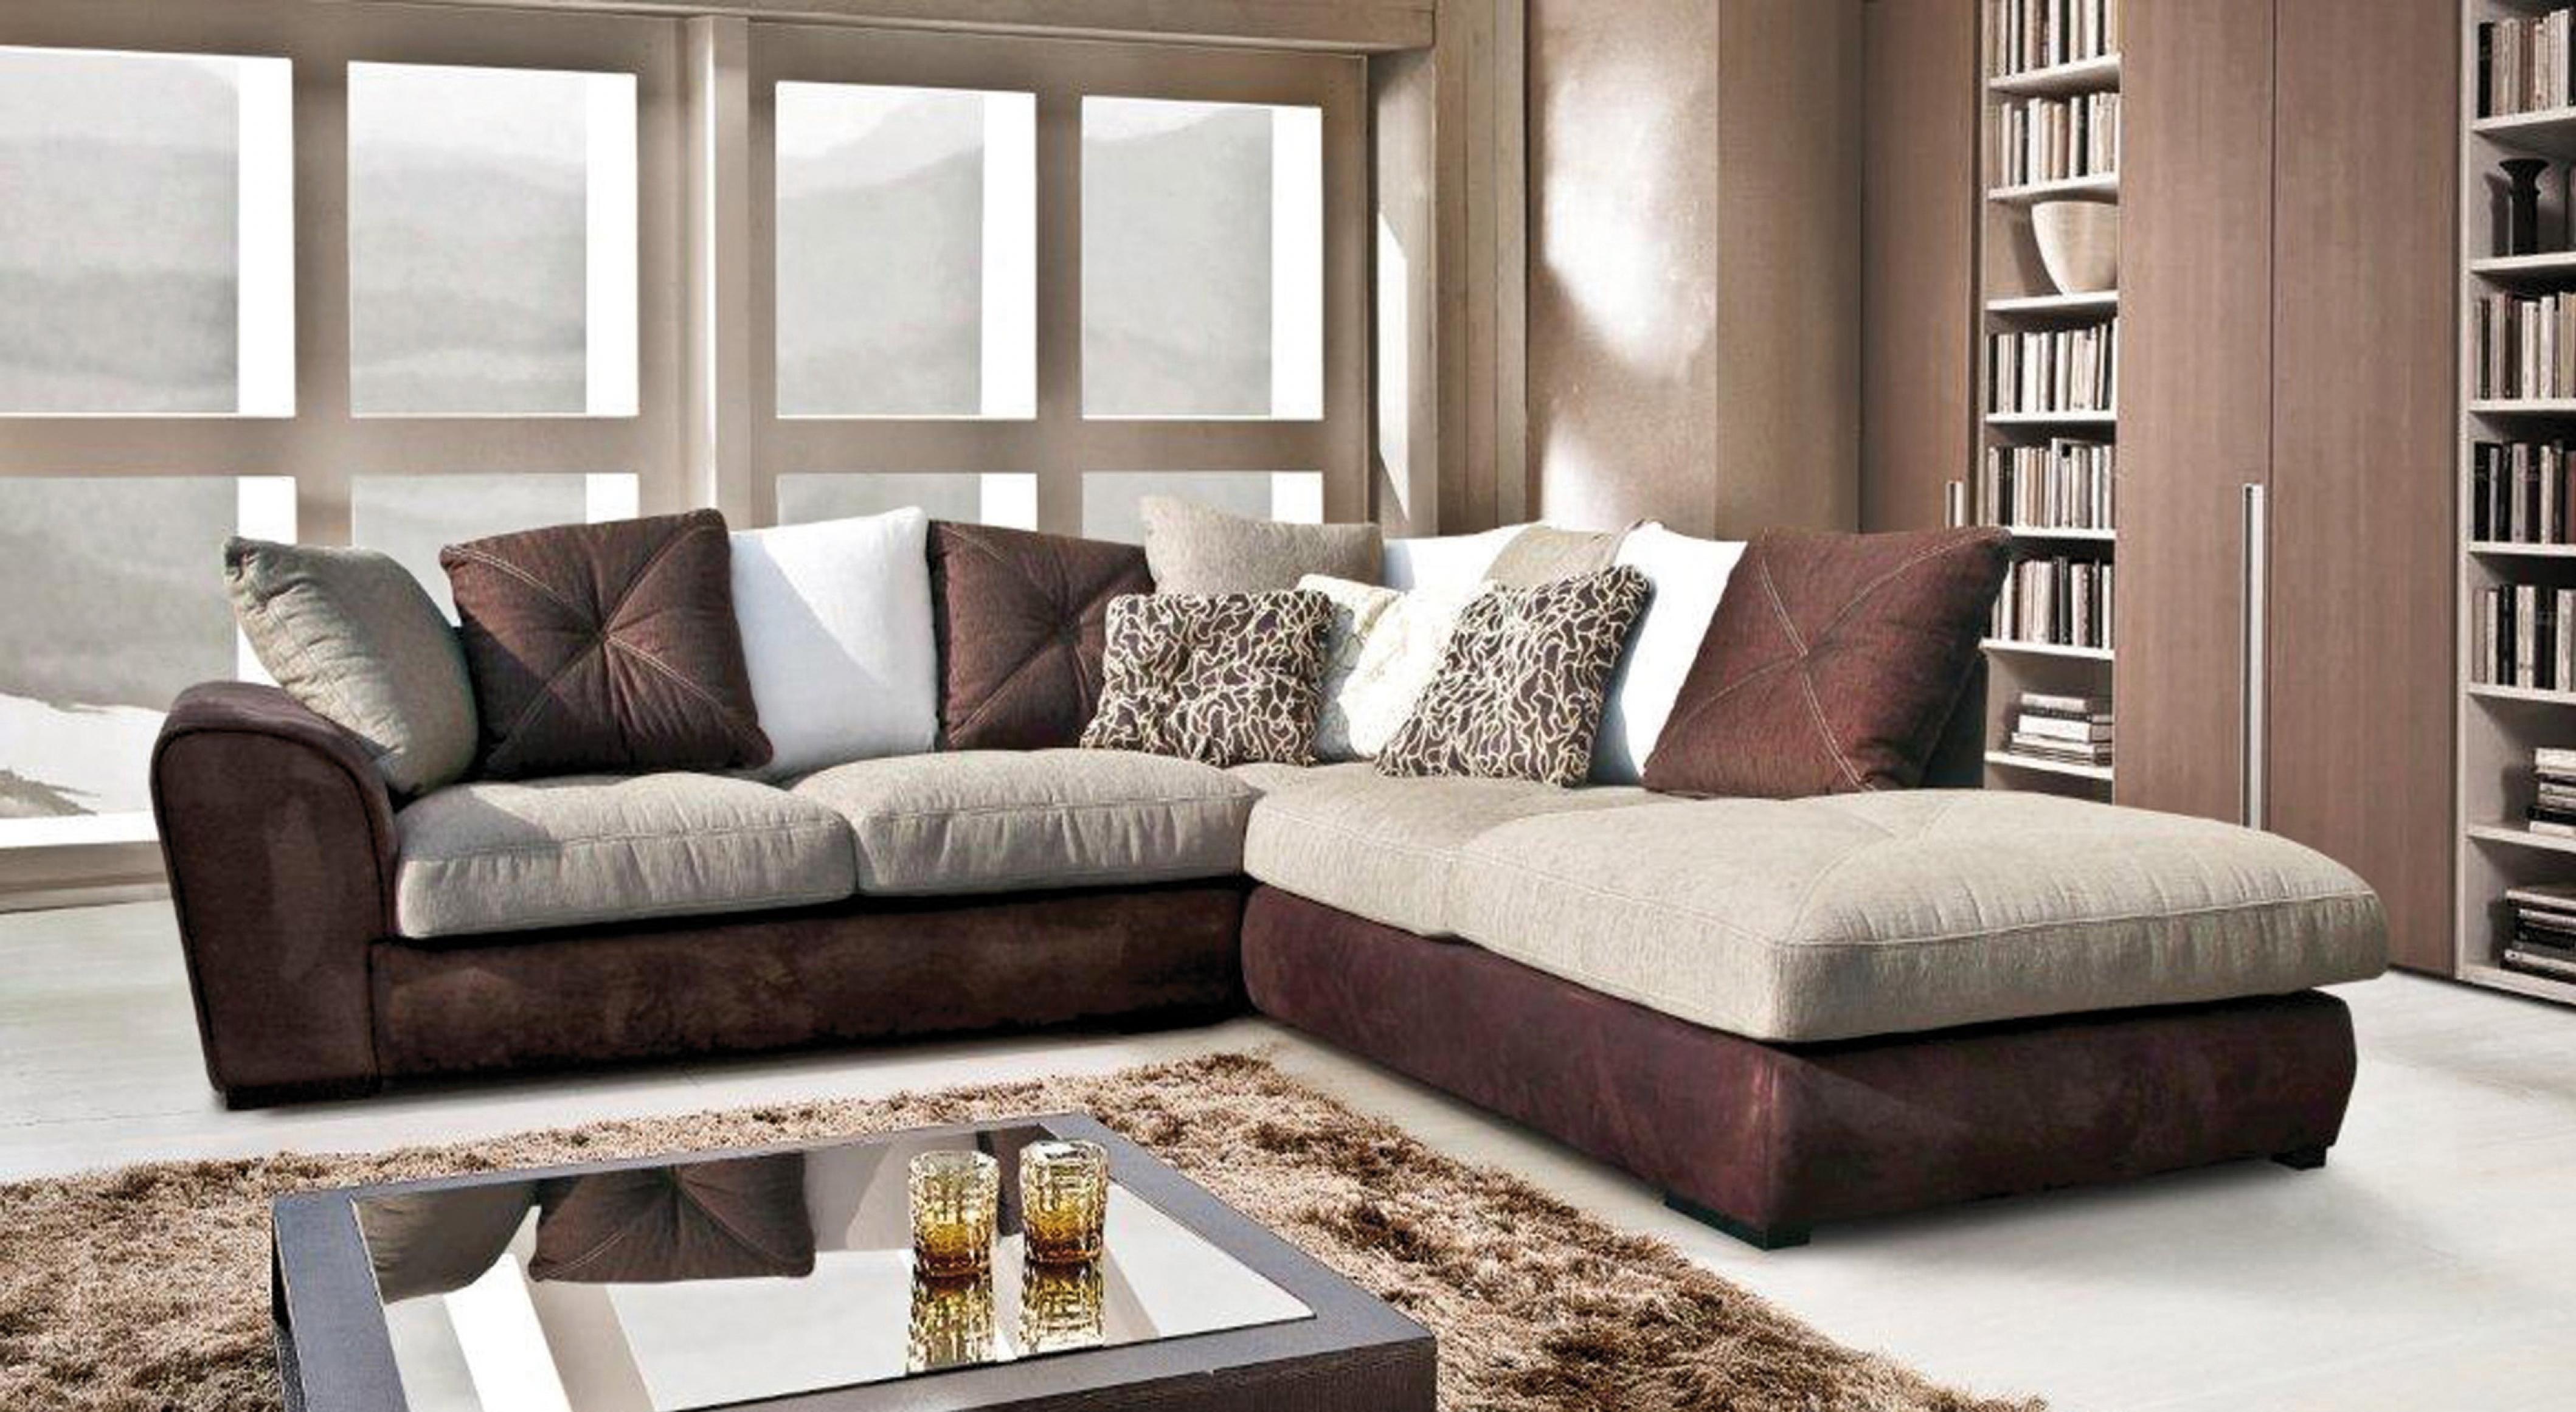 bois chiffon. Black Bedroom Furniture Sets. Home Design Ideas